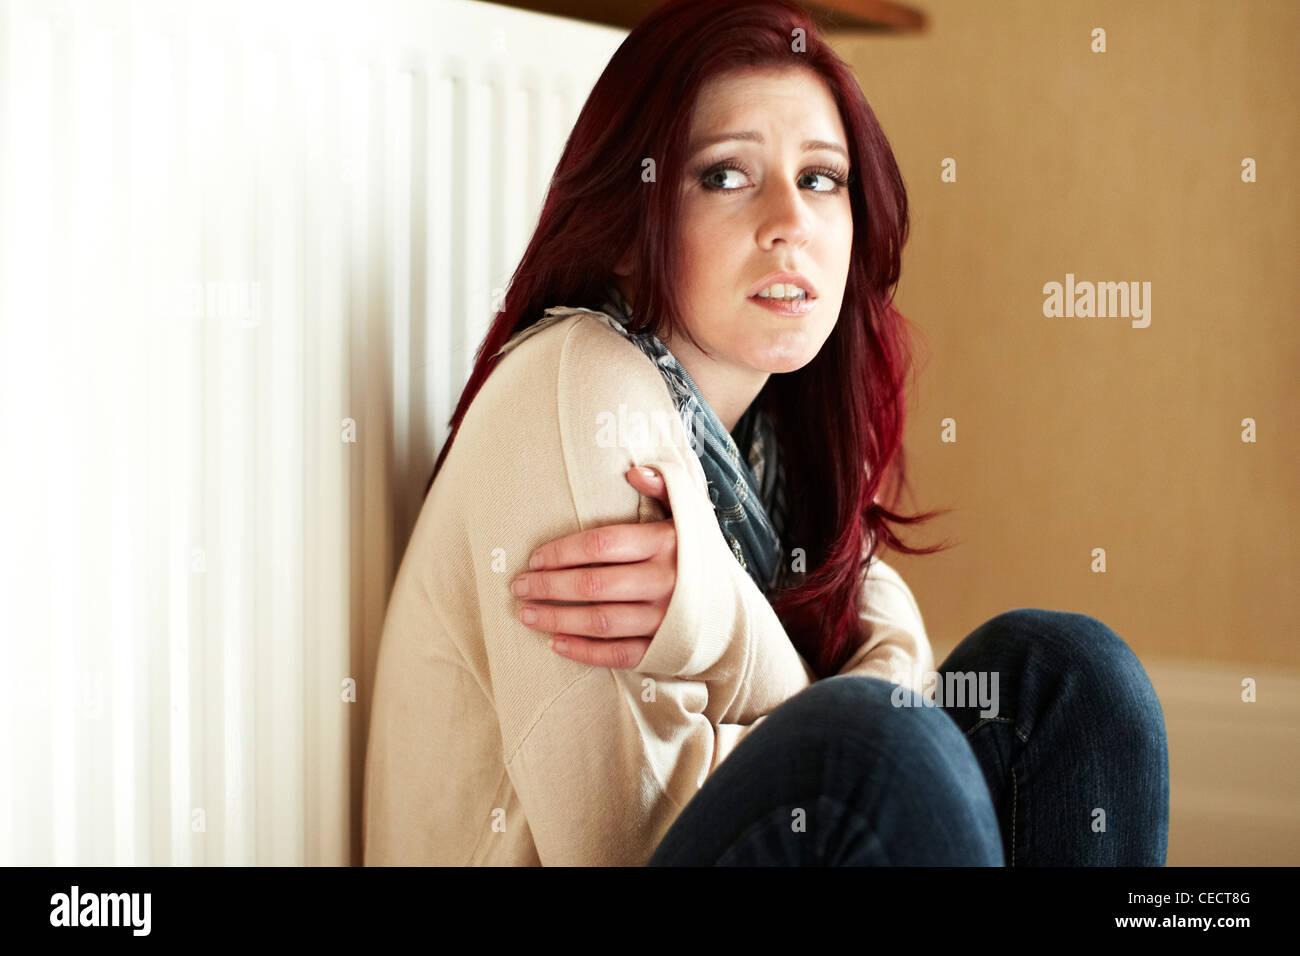 Cold girl next to radiator - Stock Image